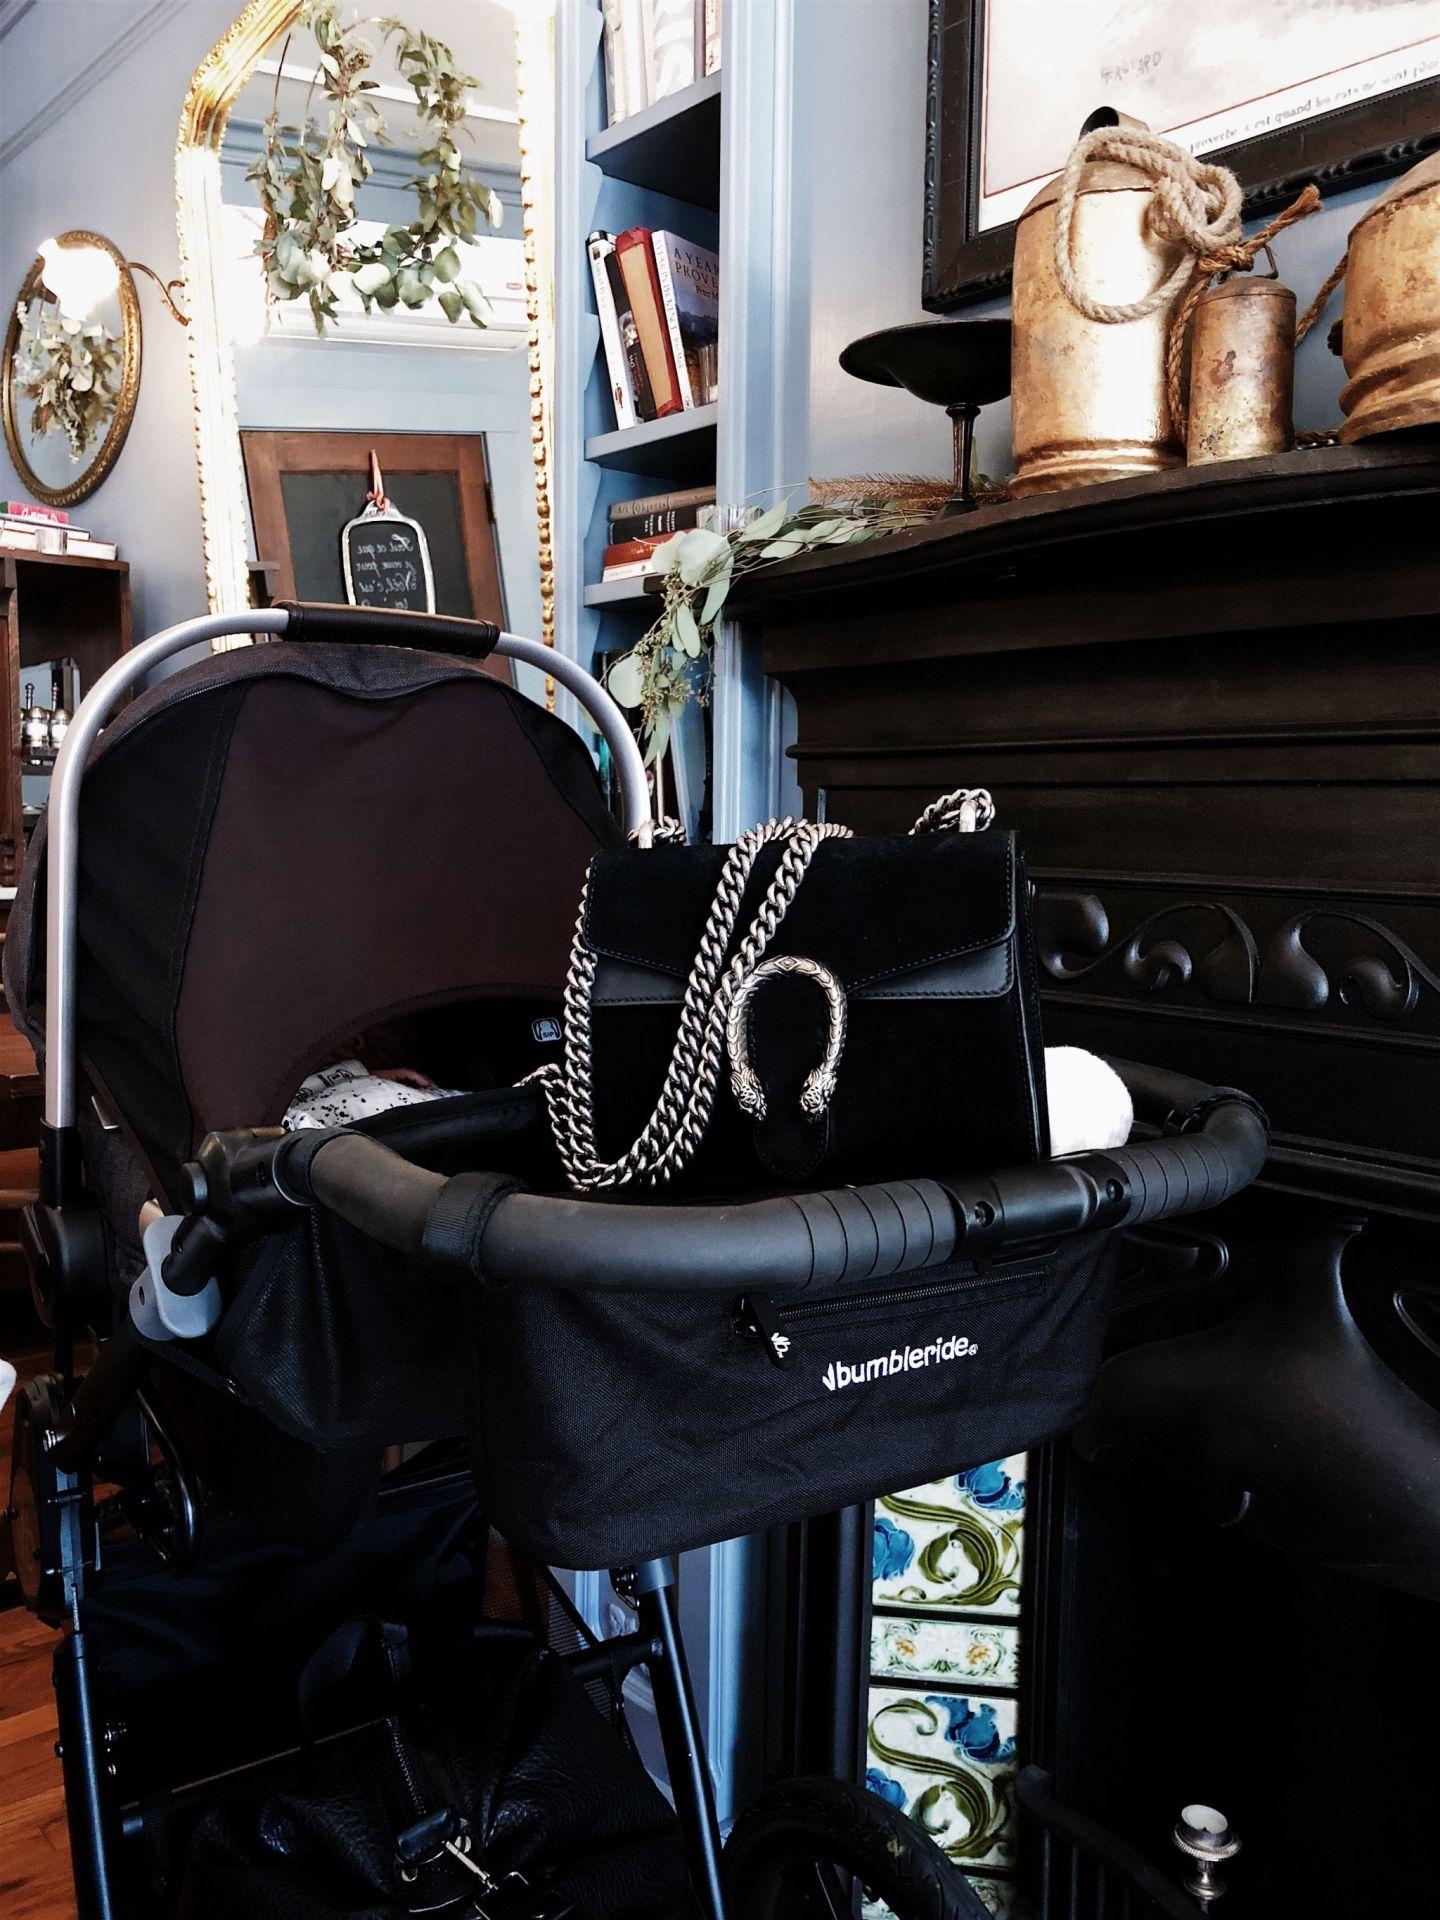 New mom baby essentials.